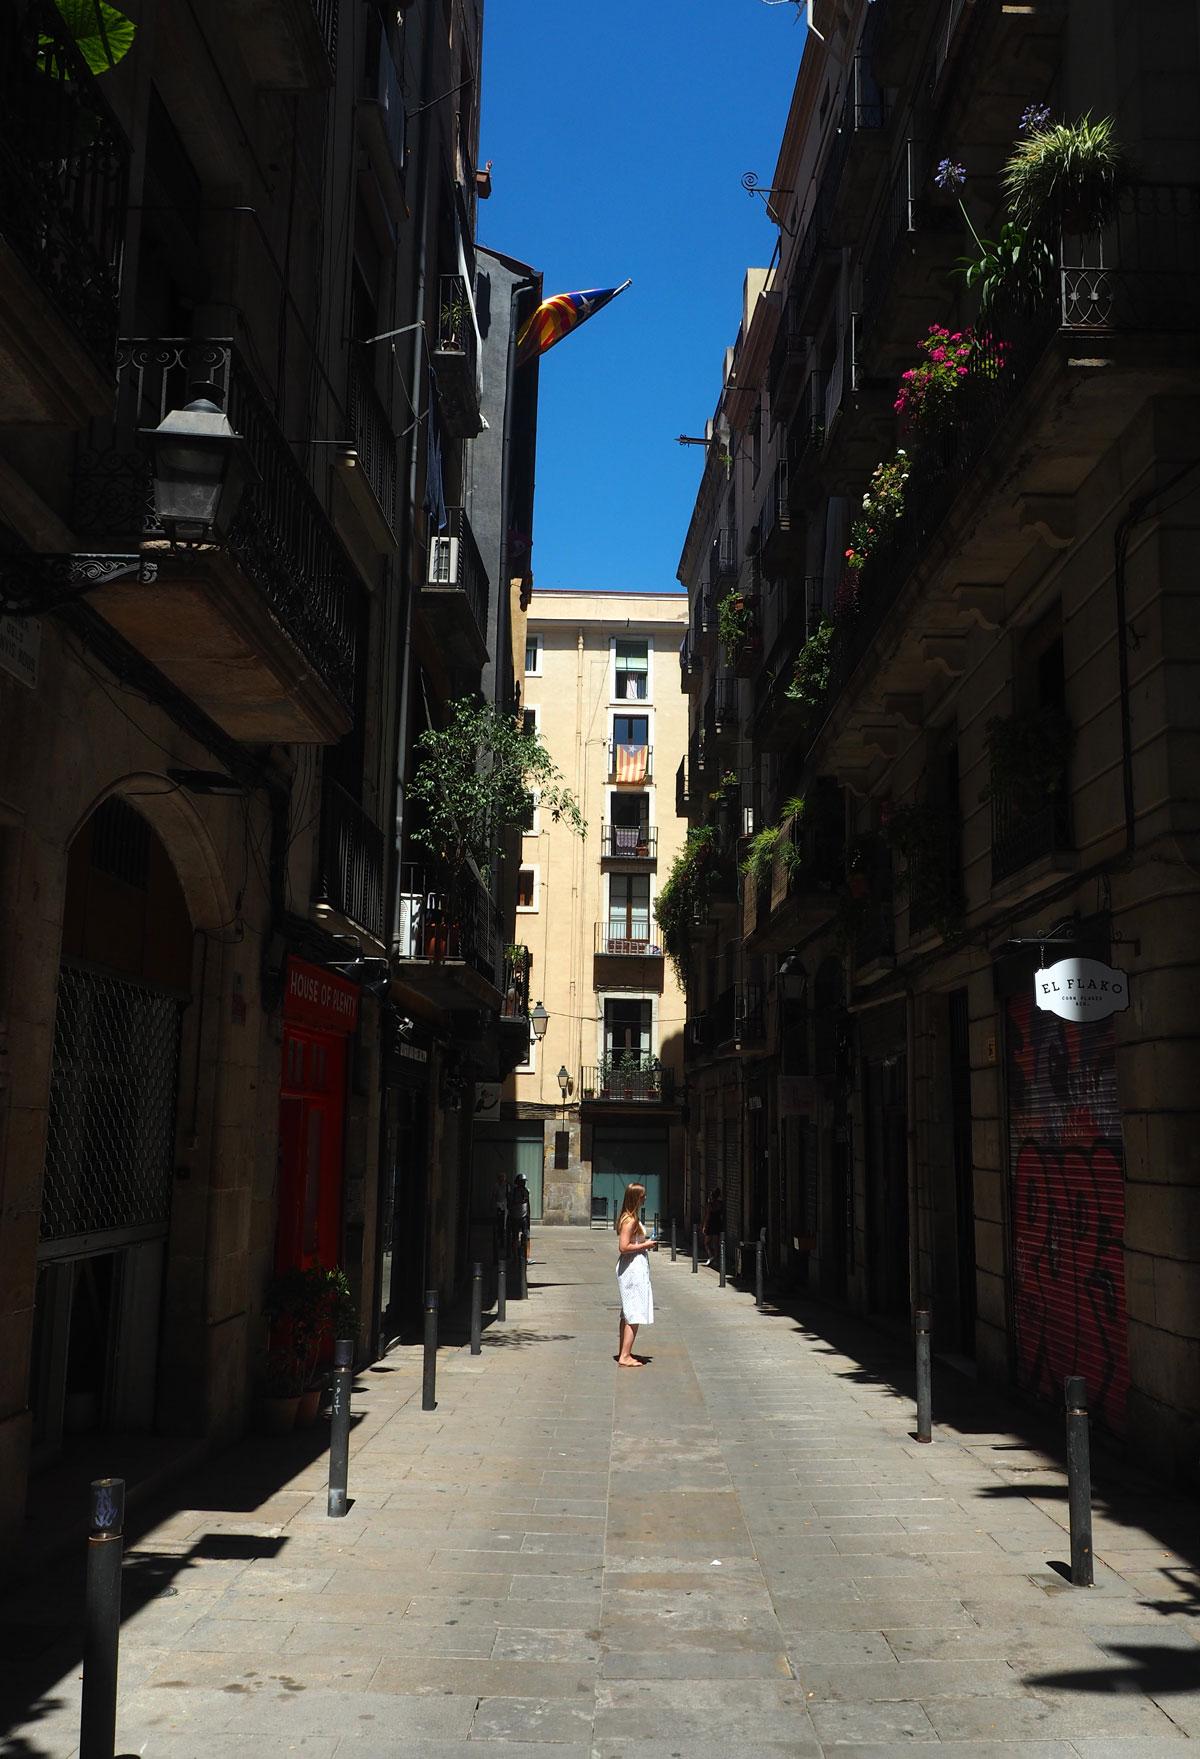 barcelonas_barri_gotic